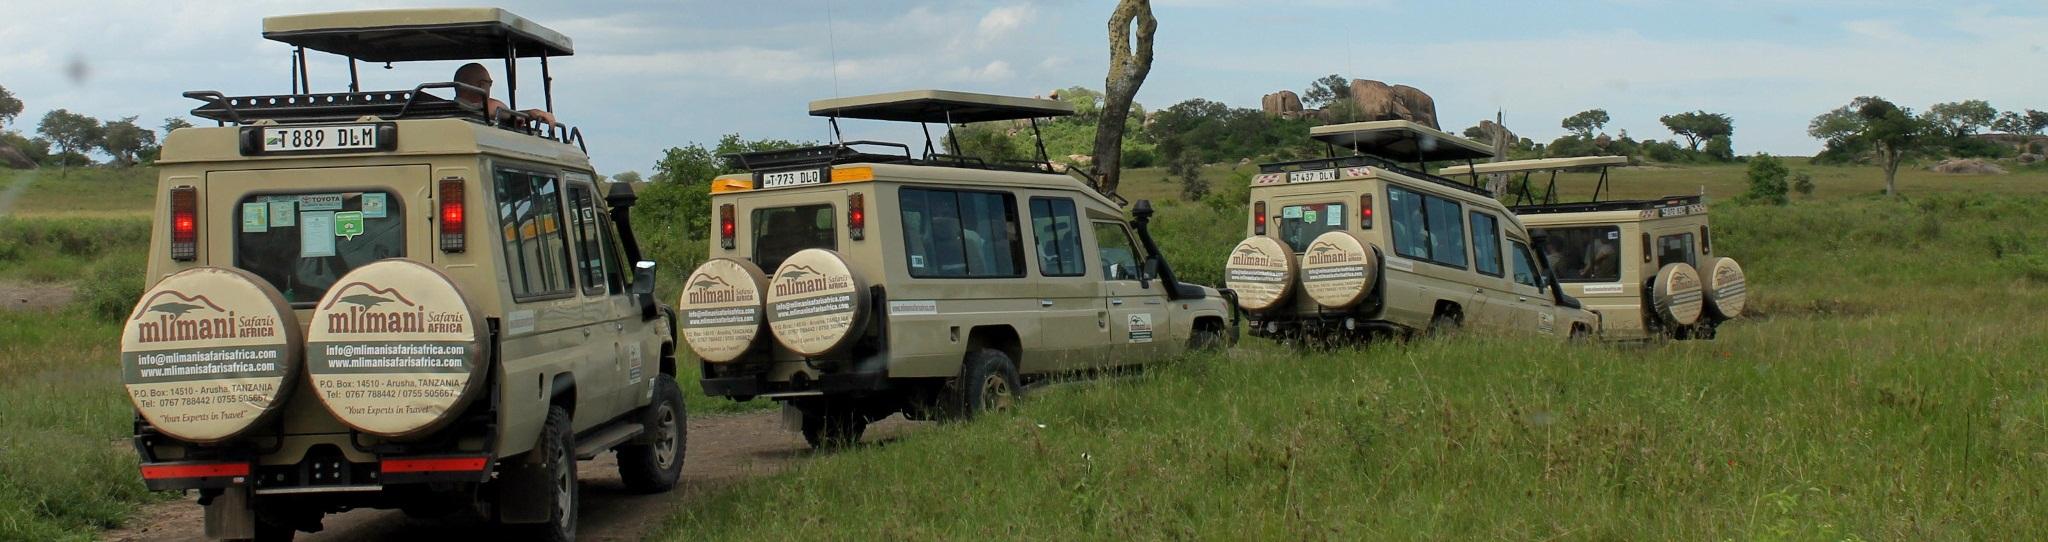 mlimani safaris africa